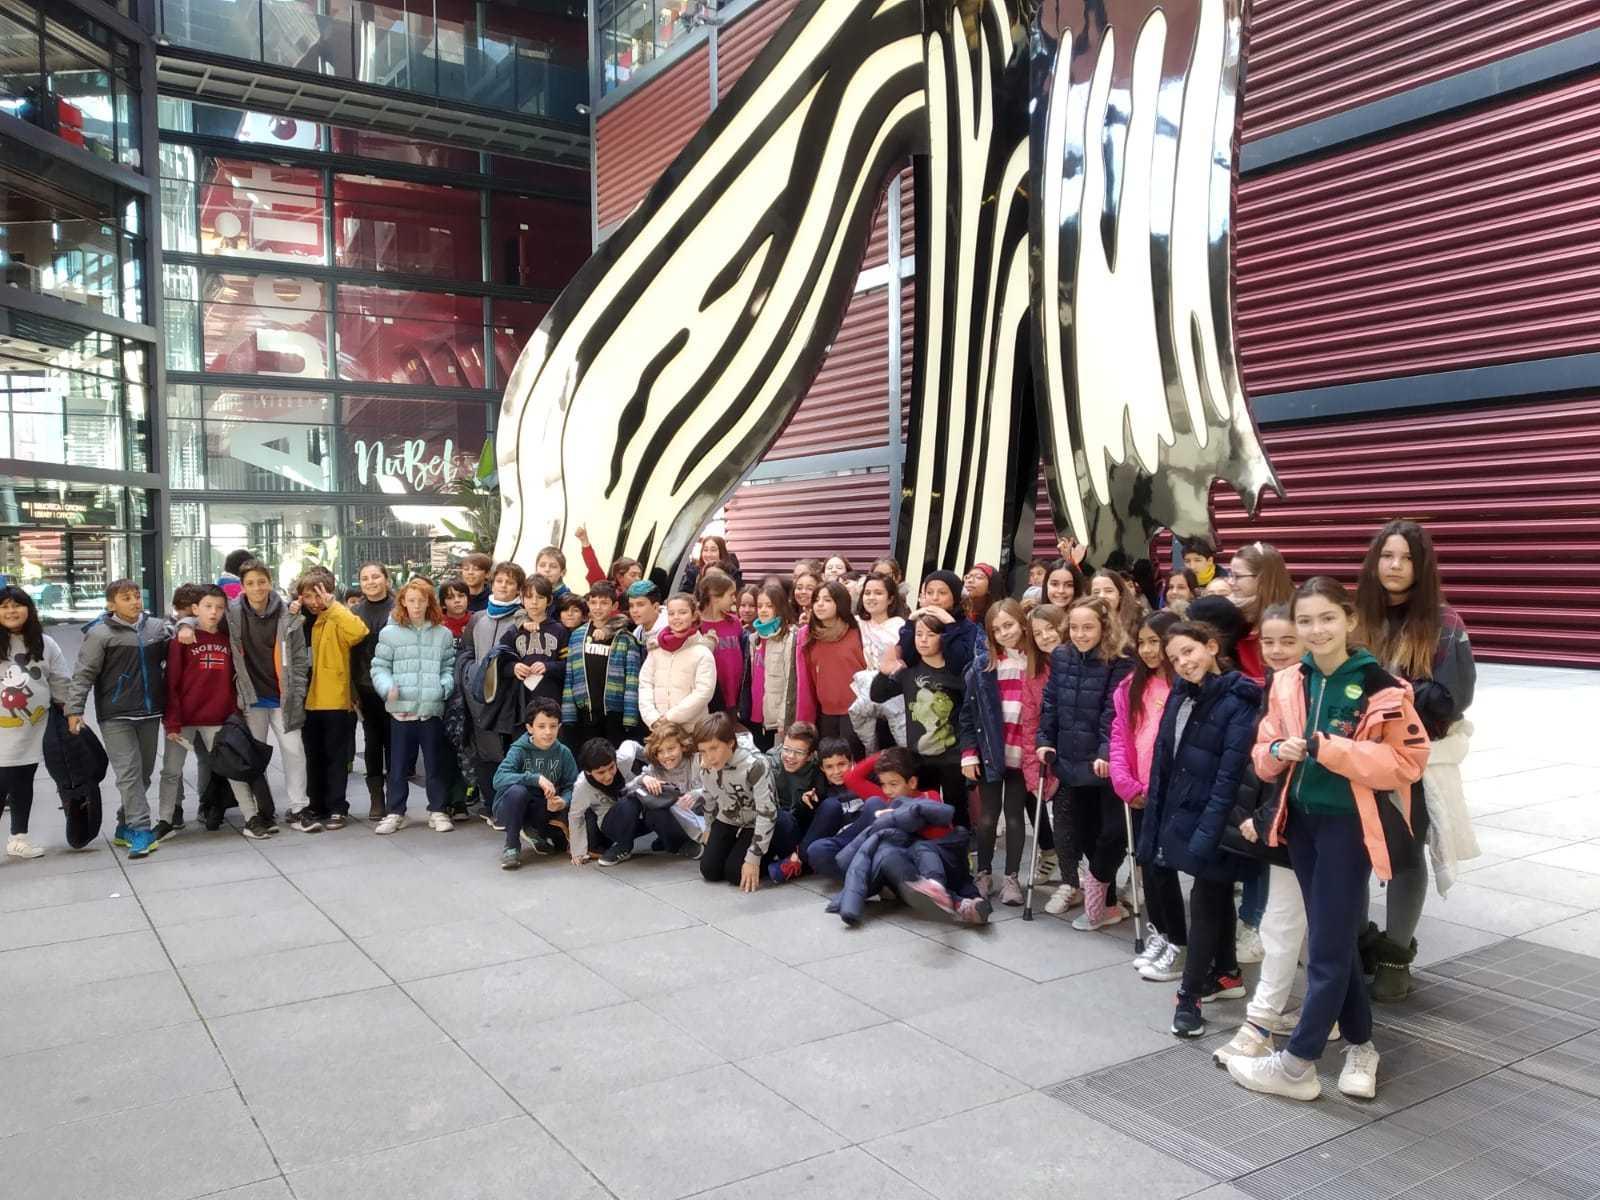 2019_02_07_Quinto visita Museo Reina Sofia_CEIP FDLR_Las Rozas 3